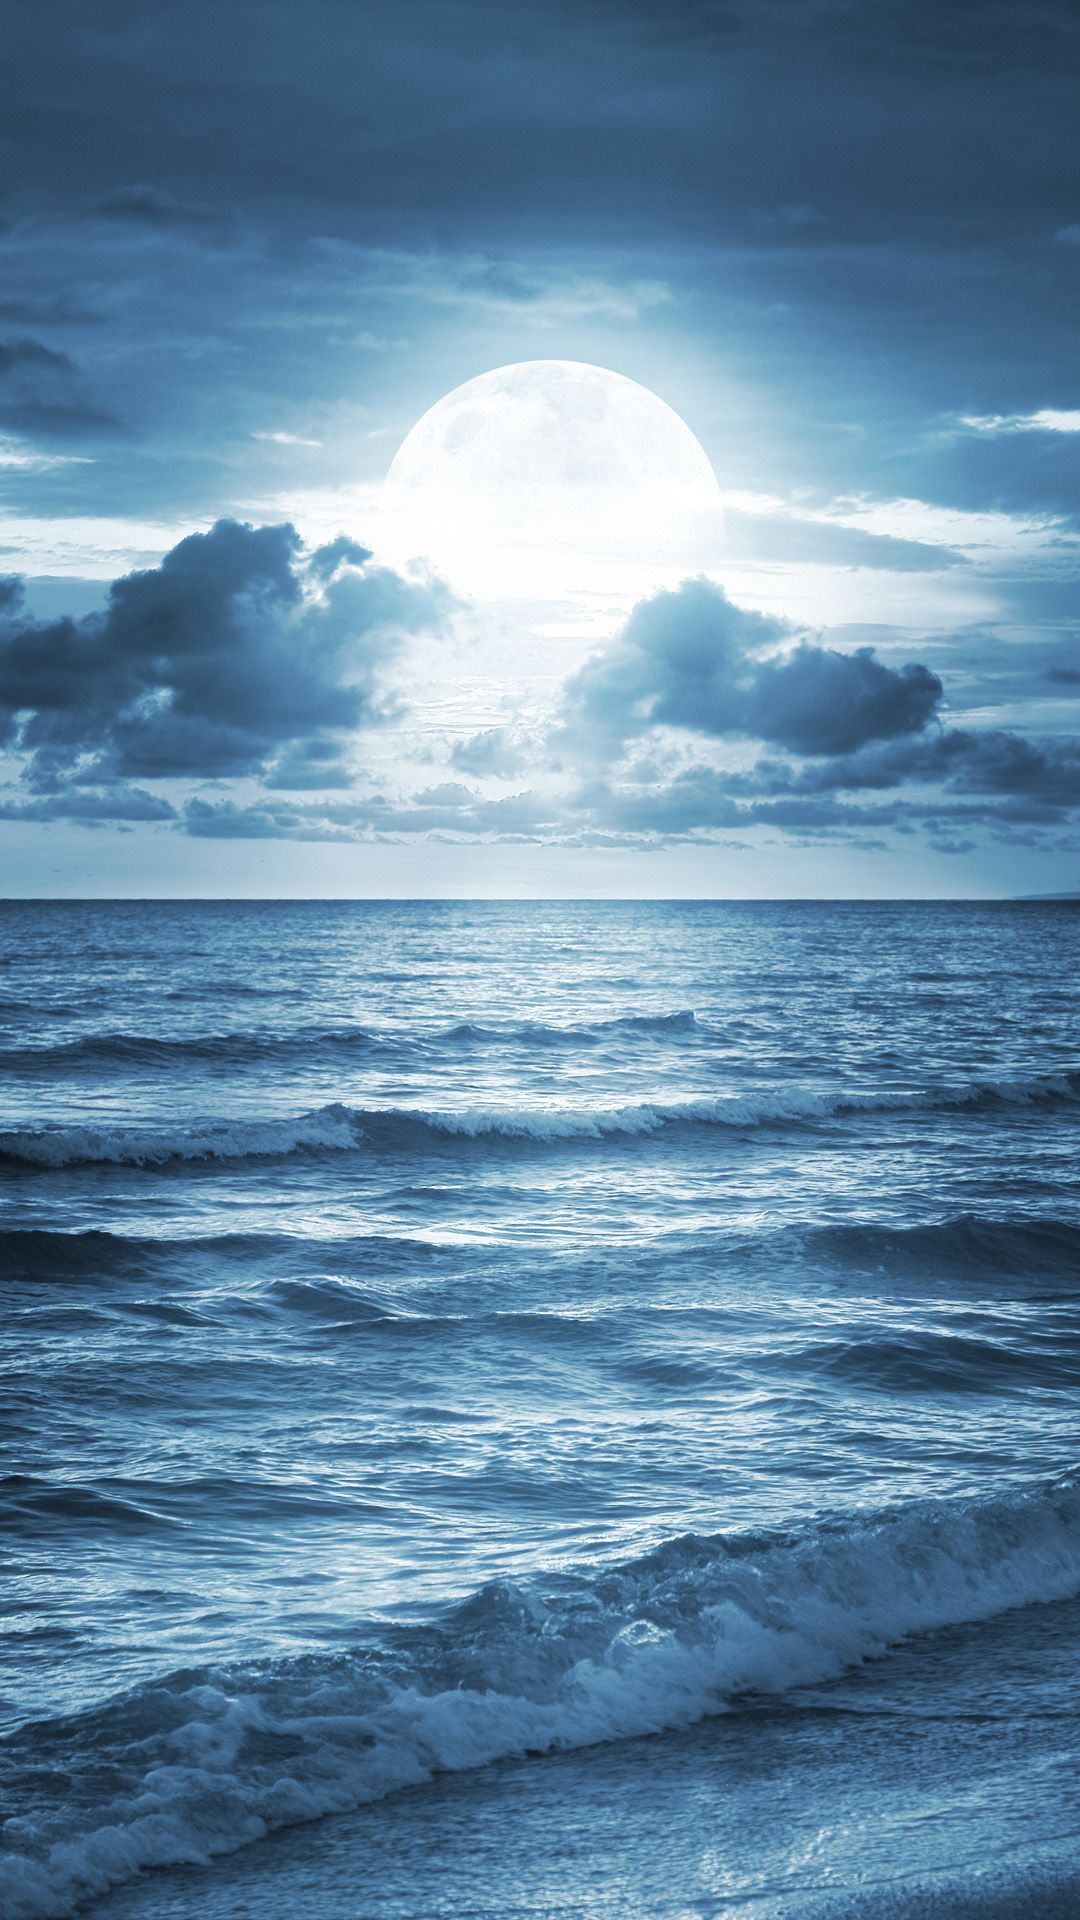 Blue Ocean Beach At Dusk Iphone 6 Wallpaper Beautiful Moon Beautiful Nature Beautiful Nature Wallpaper